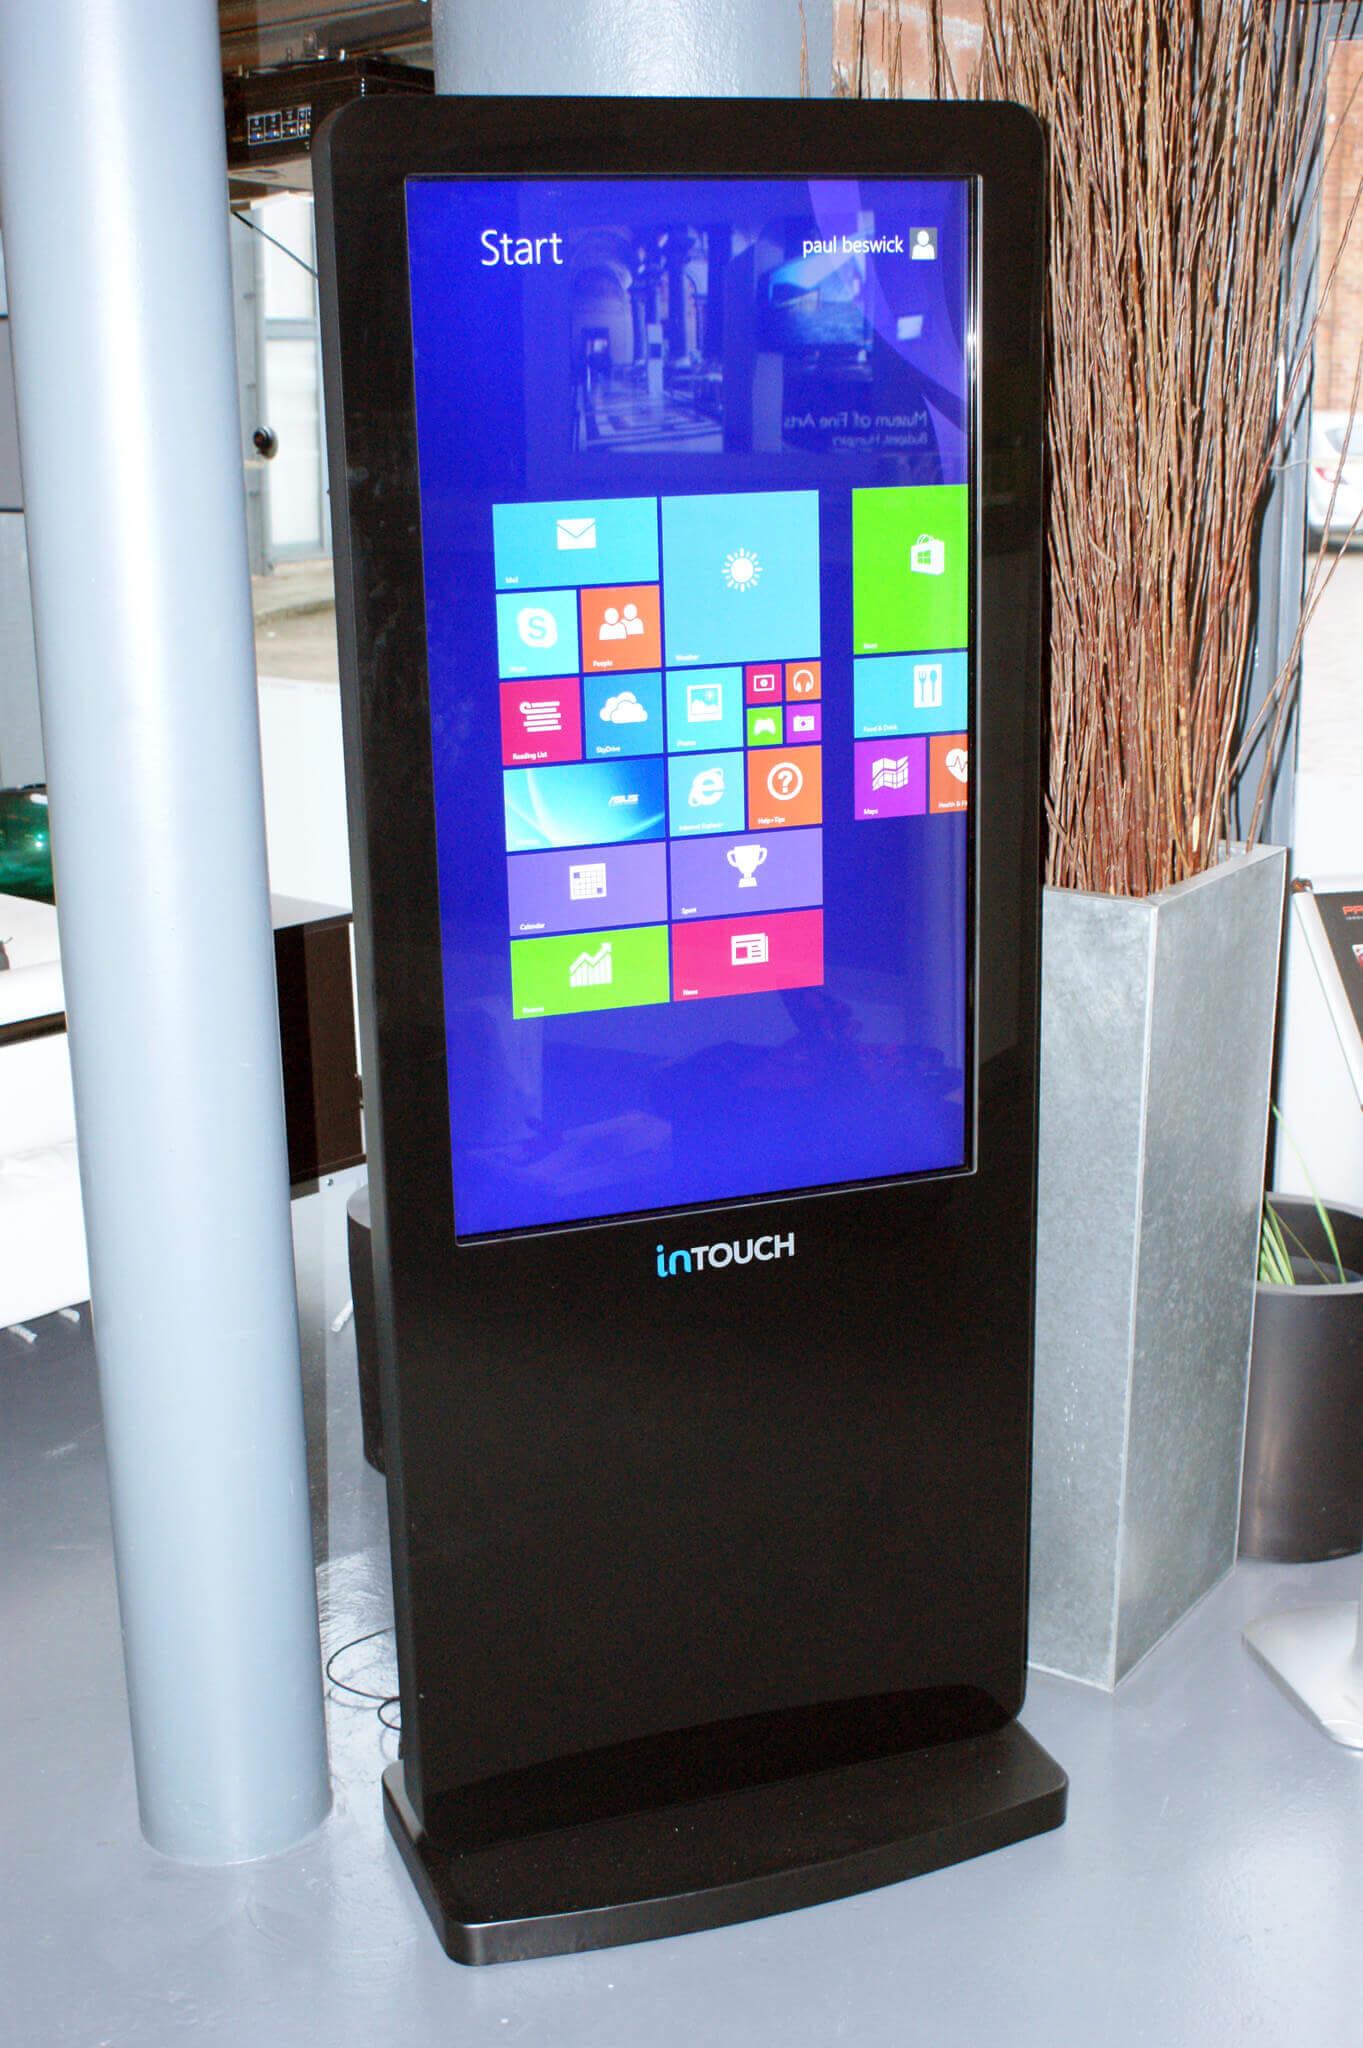 lcd-touch-kiosk-hotel-receptions.jpg